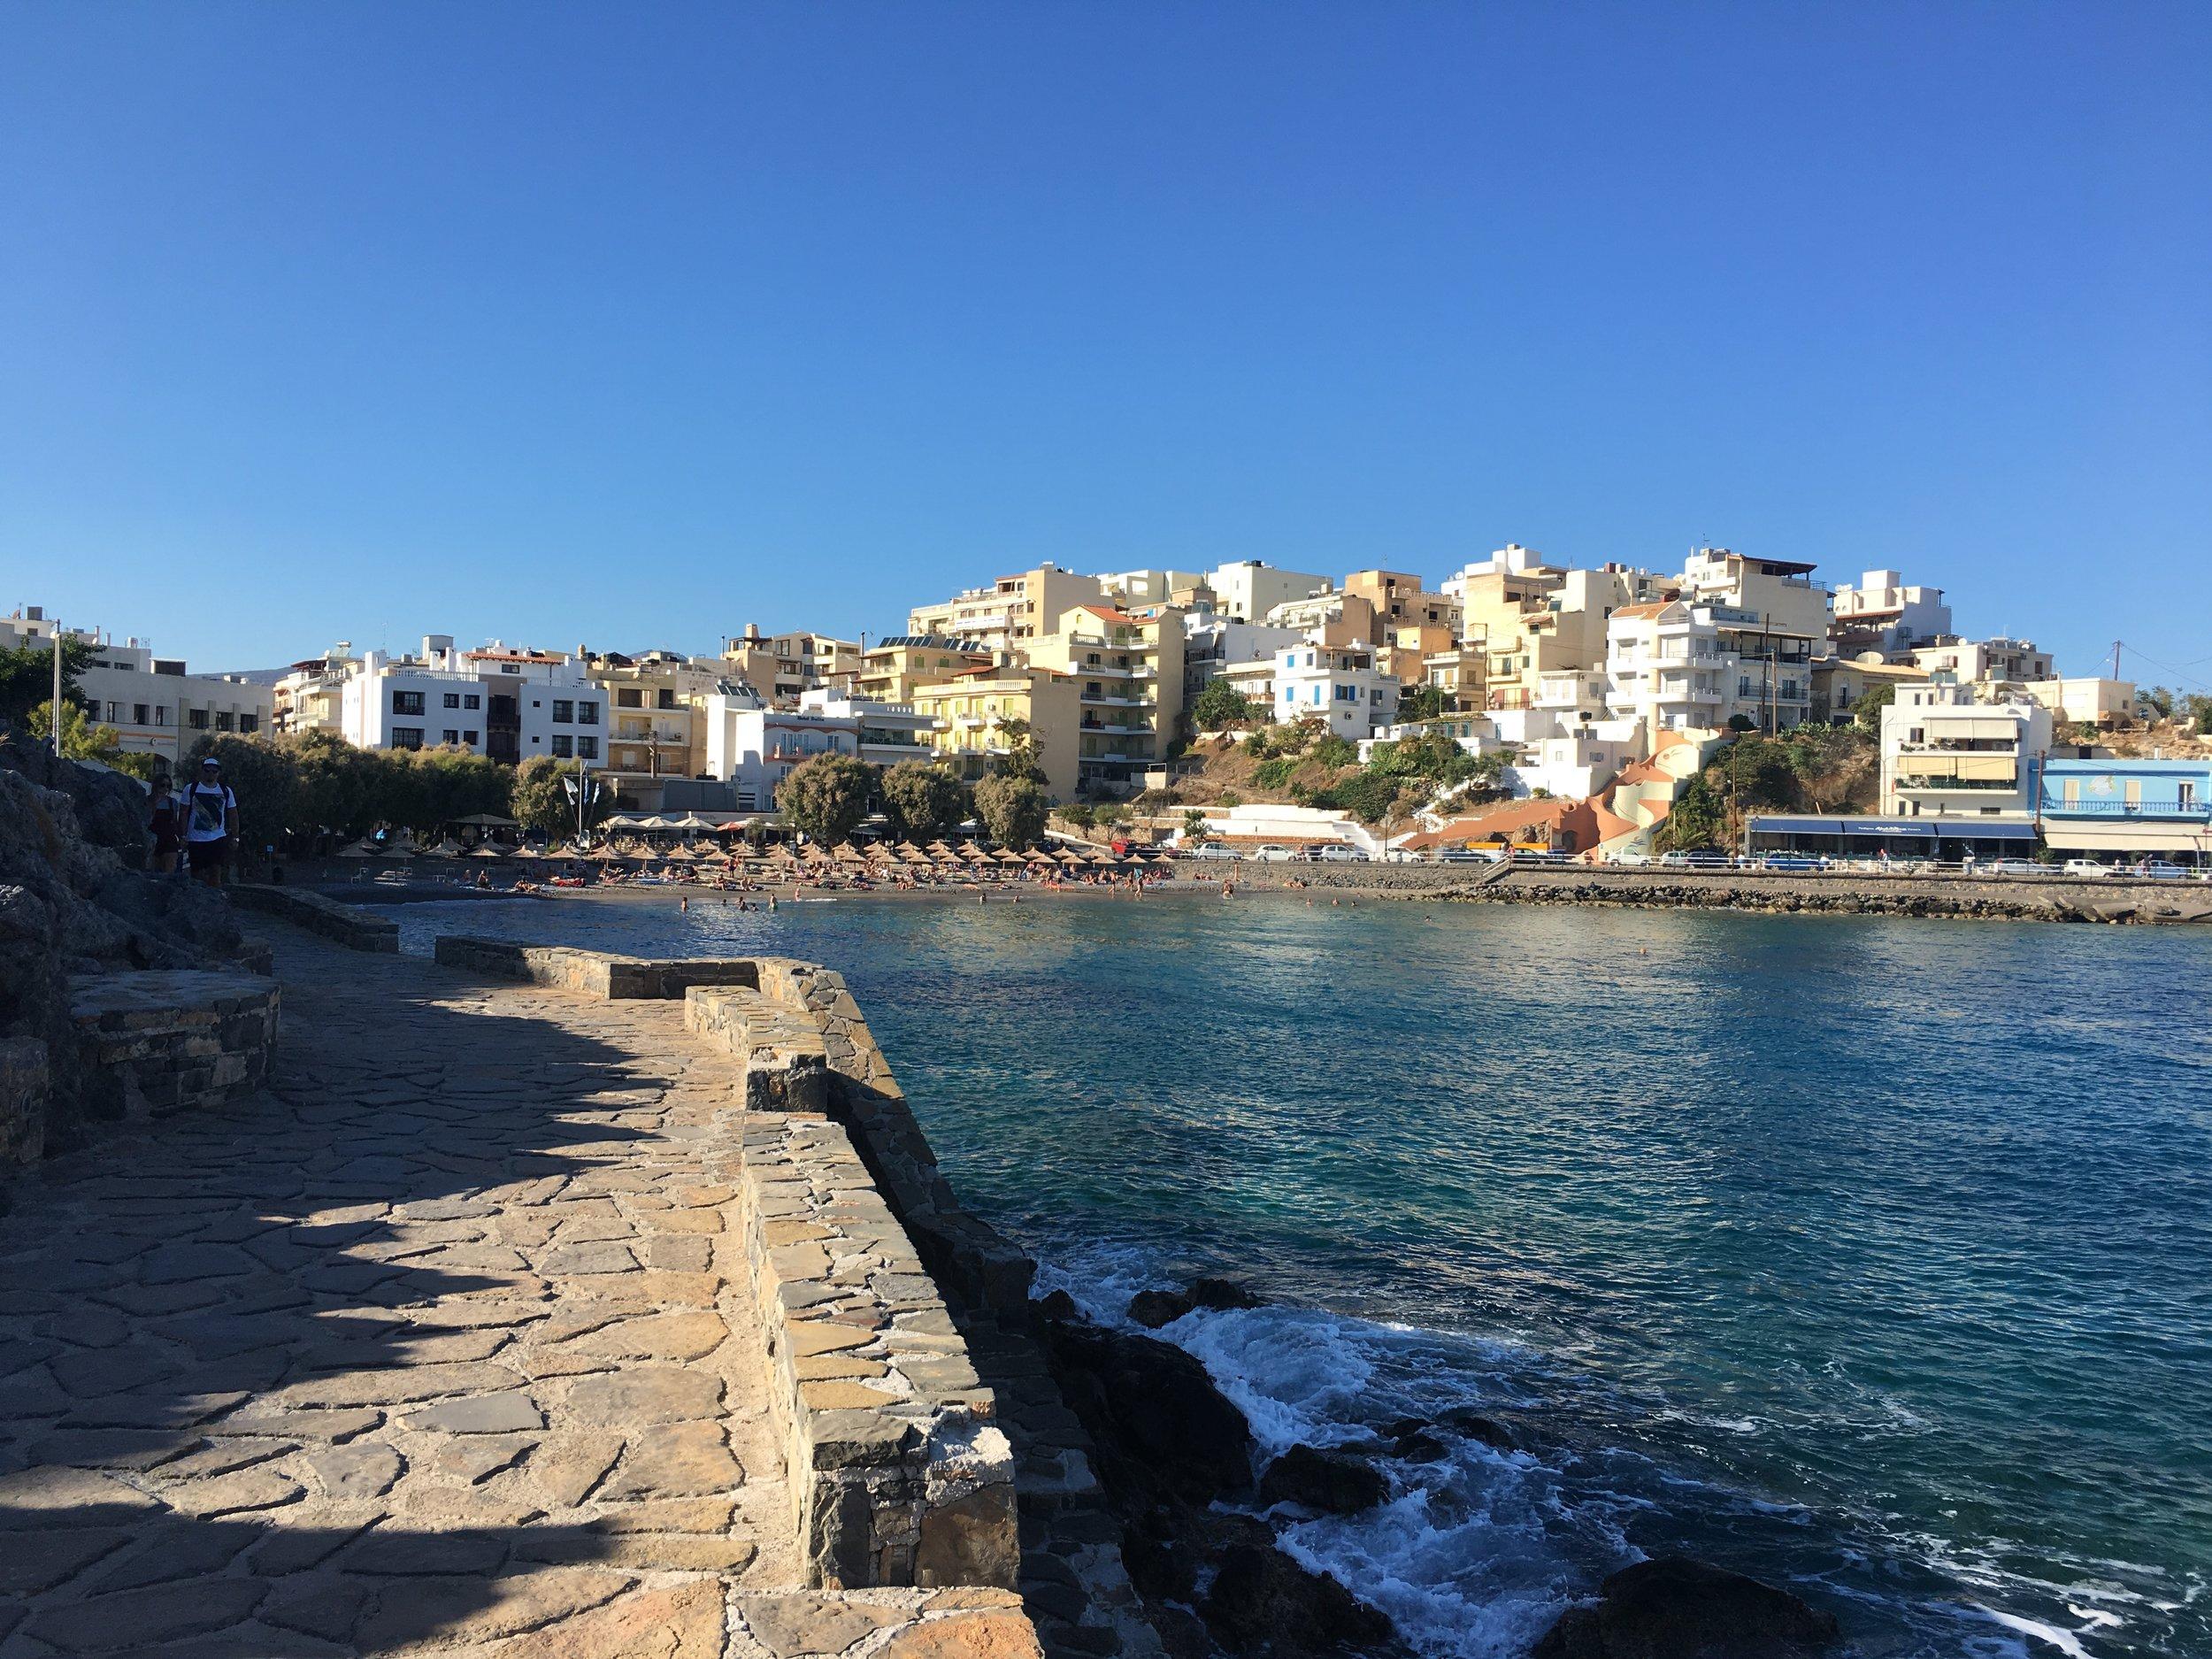 One of the beaches in Agios Nikolaus